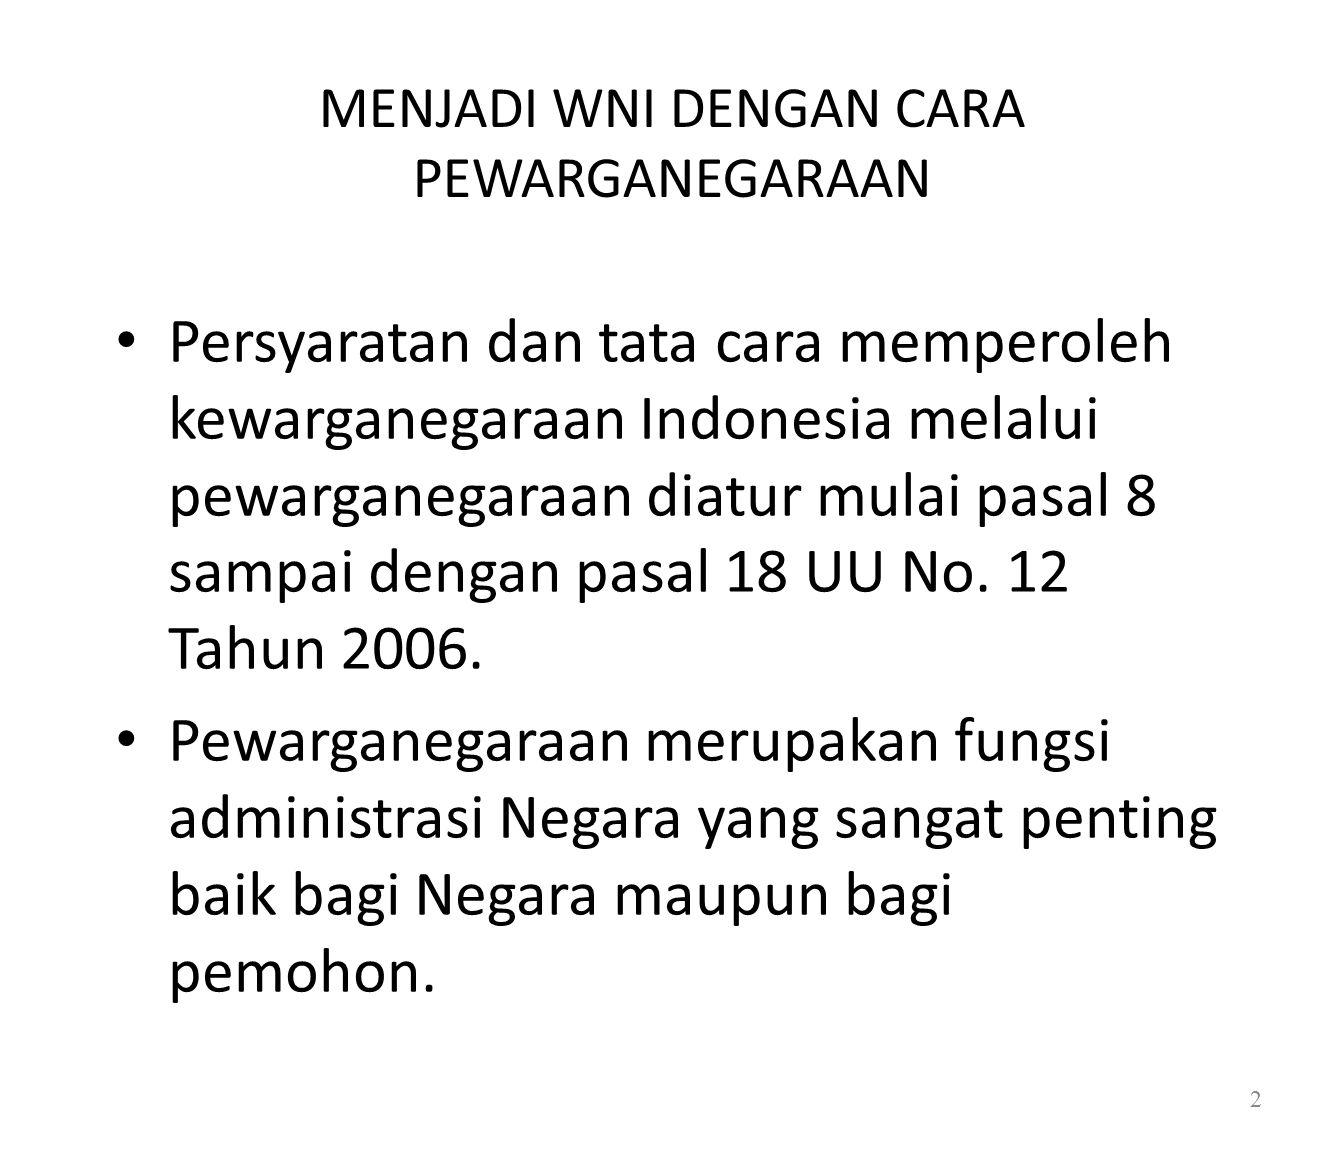 MENJADI WNI DENGAN CARA PEWARGANEGARAAN Persyaratan dan tata cara memperoleh kewarganegaraan Indonesia melalui pewarganegaraan diatur mulai pasal 8 sampai dengan pasal 18 UU No.